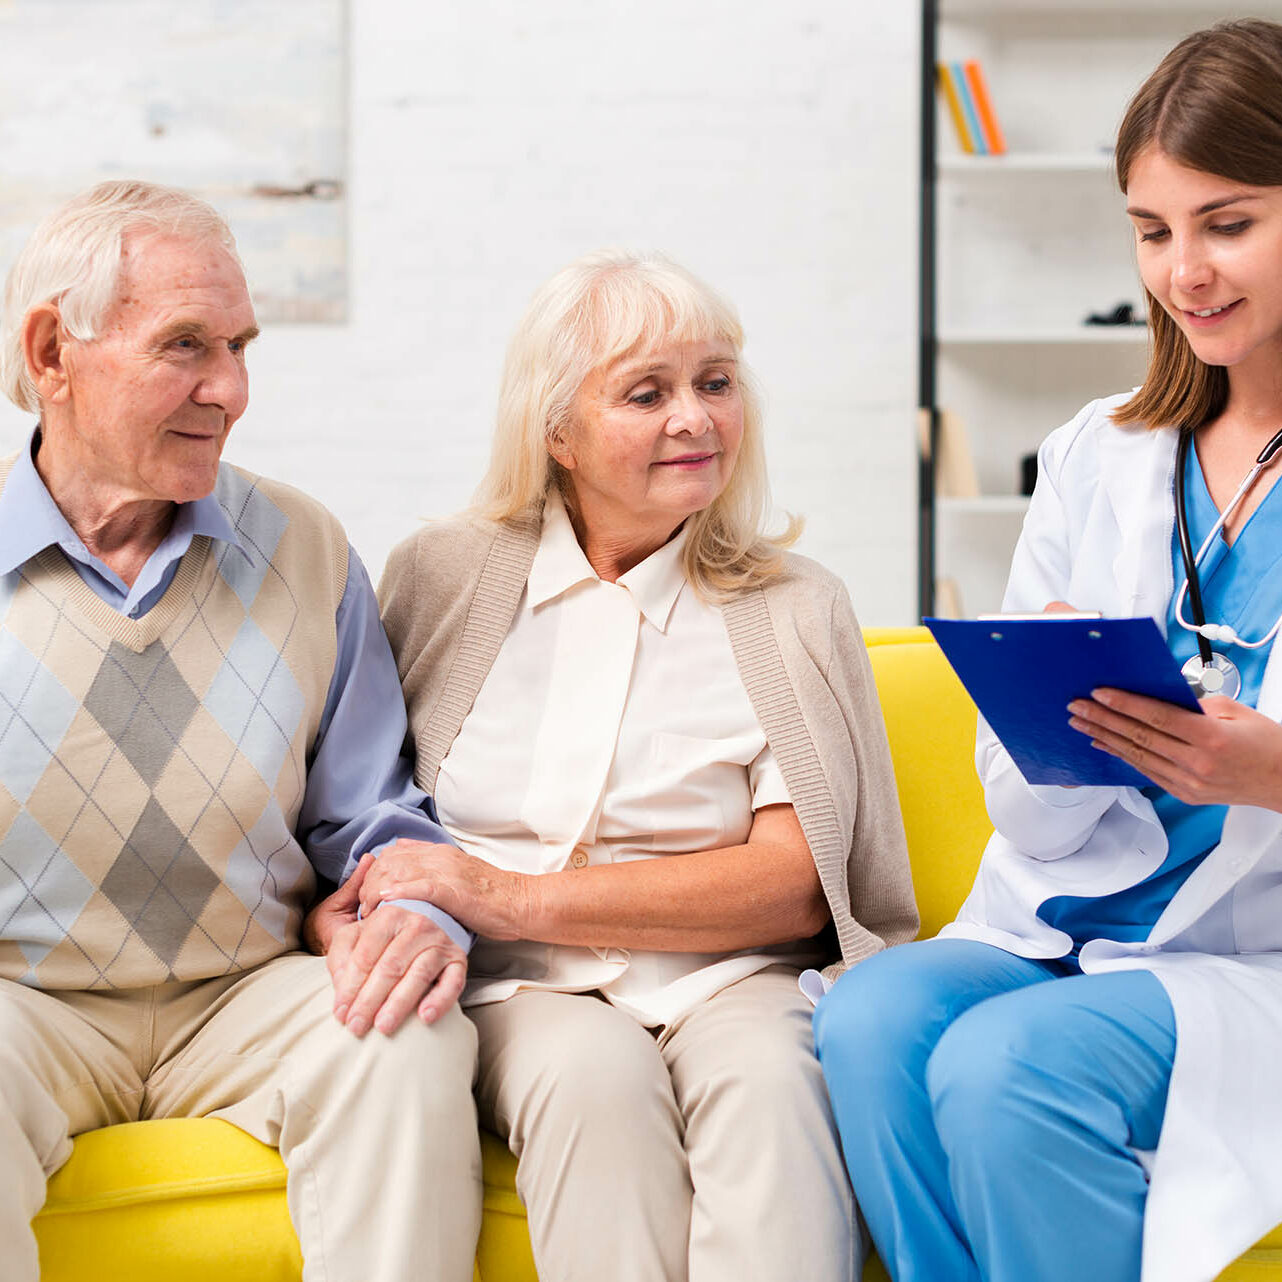 nurse-sitting-with-old-man-woman-sofa